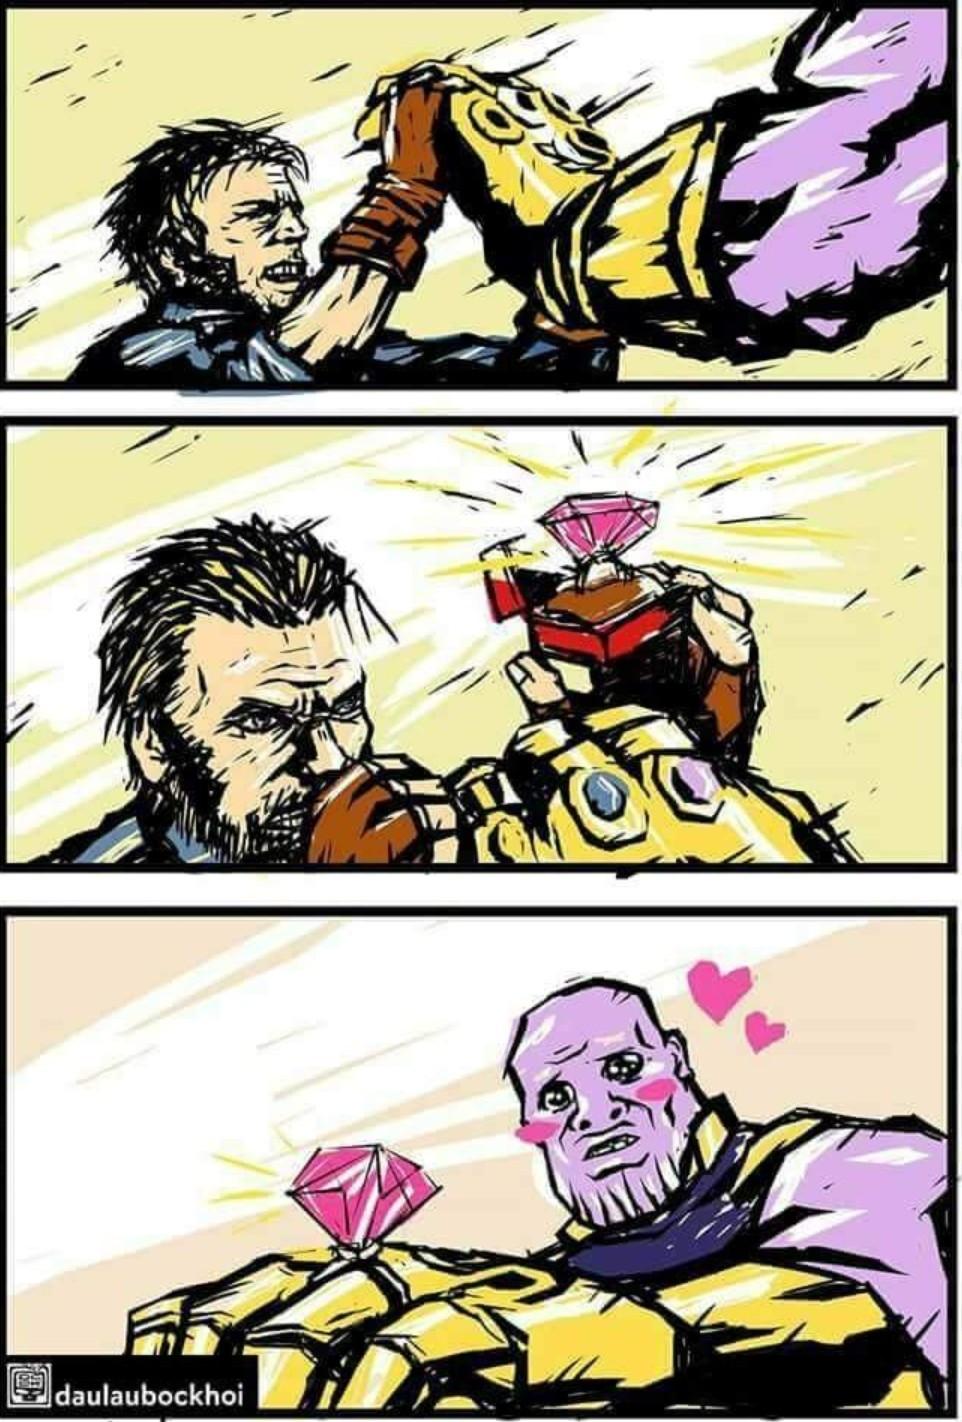 S-sempai? Se o Thanos tivesse percebido... - meme